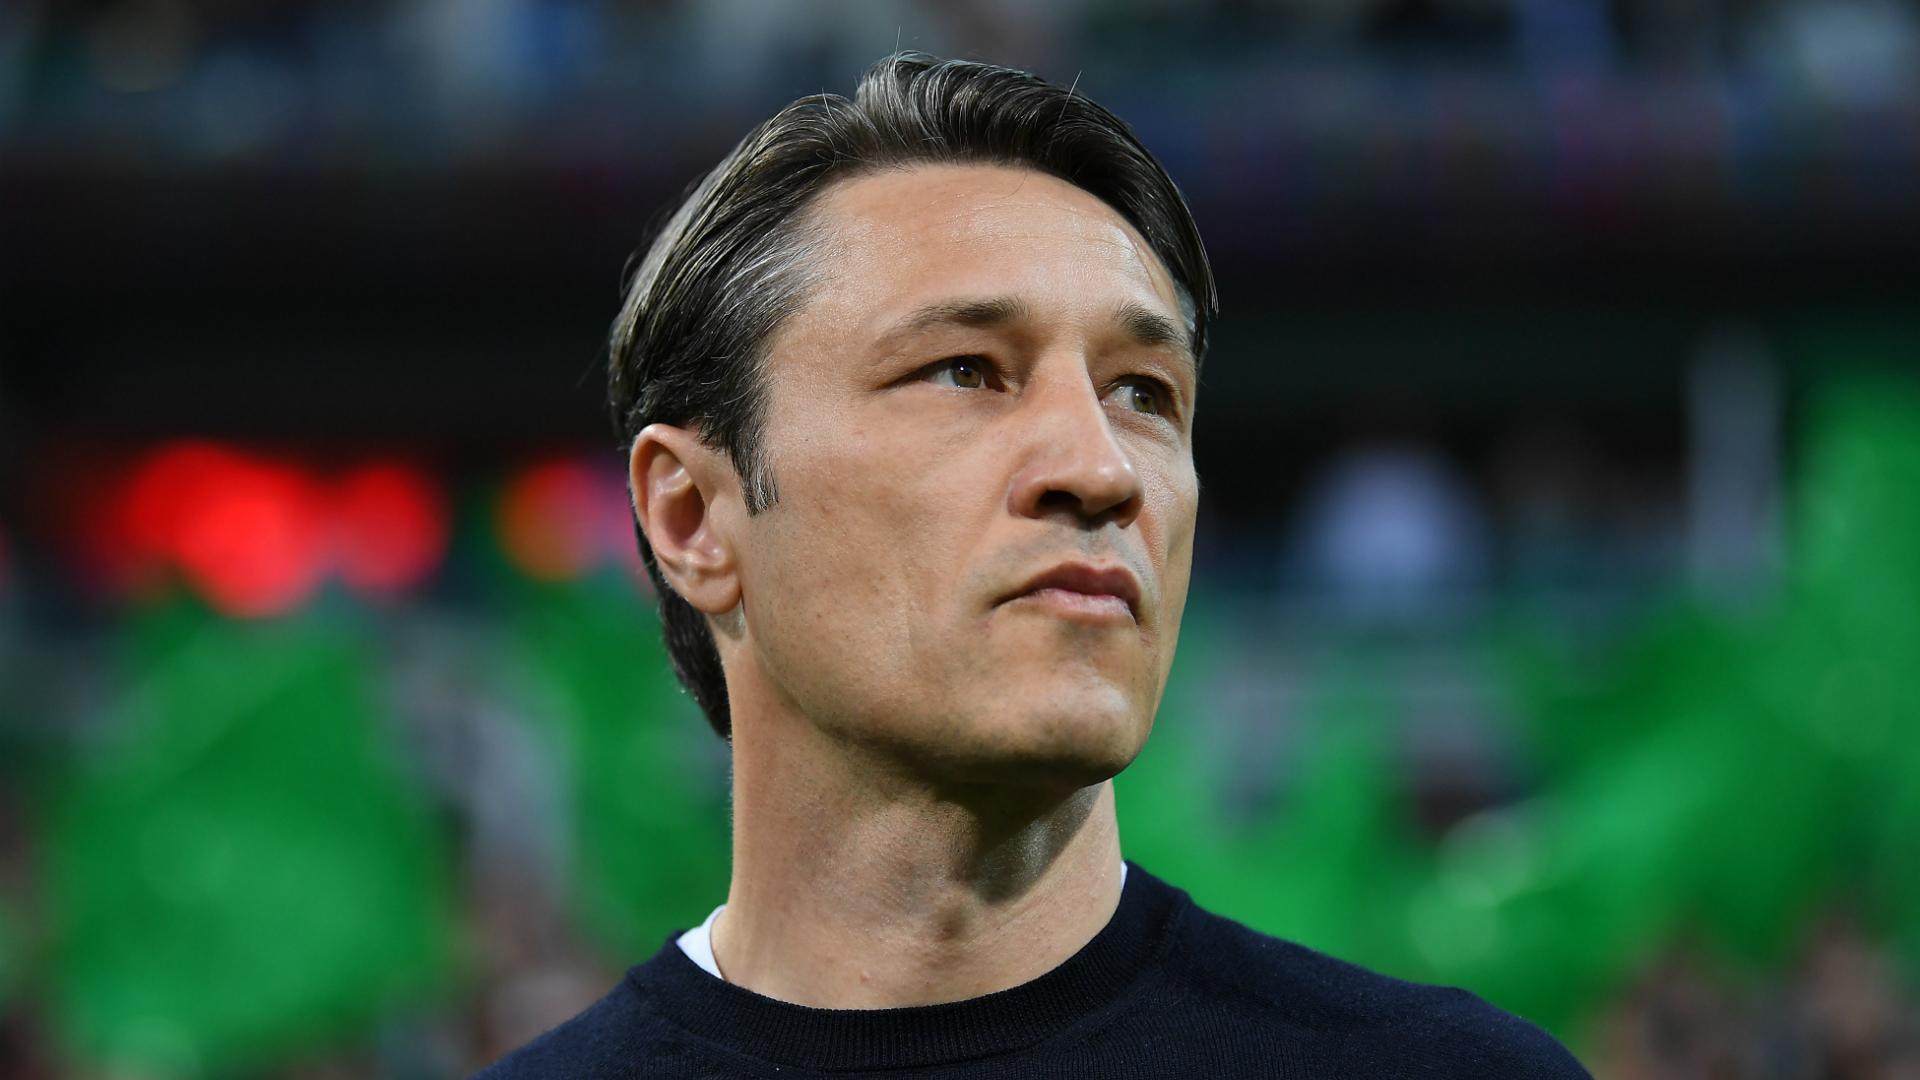 Kovac sets Bayern Bundesliga title challenge in battle with Borussia Dortmund